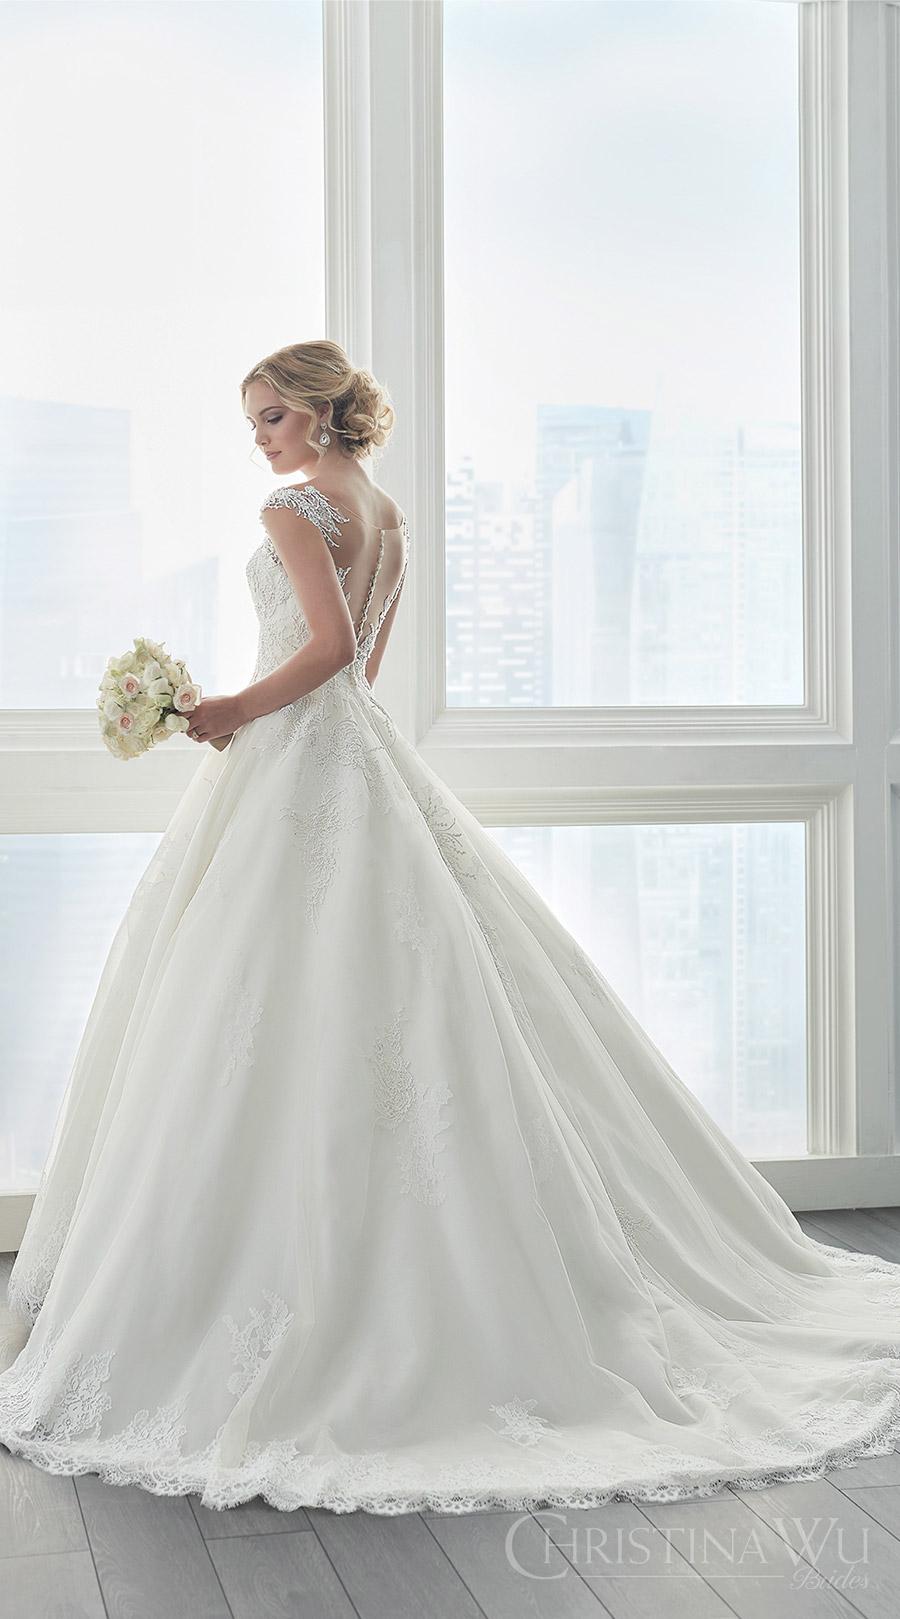 christina wu brides spring 2017 bridal sleeveless illusion cap sleeves deep sweetheart a line beadd lace ball gown wedding dress (15626) bv princess romantic